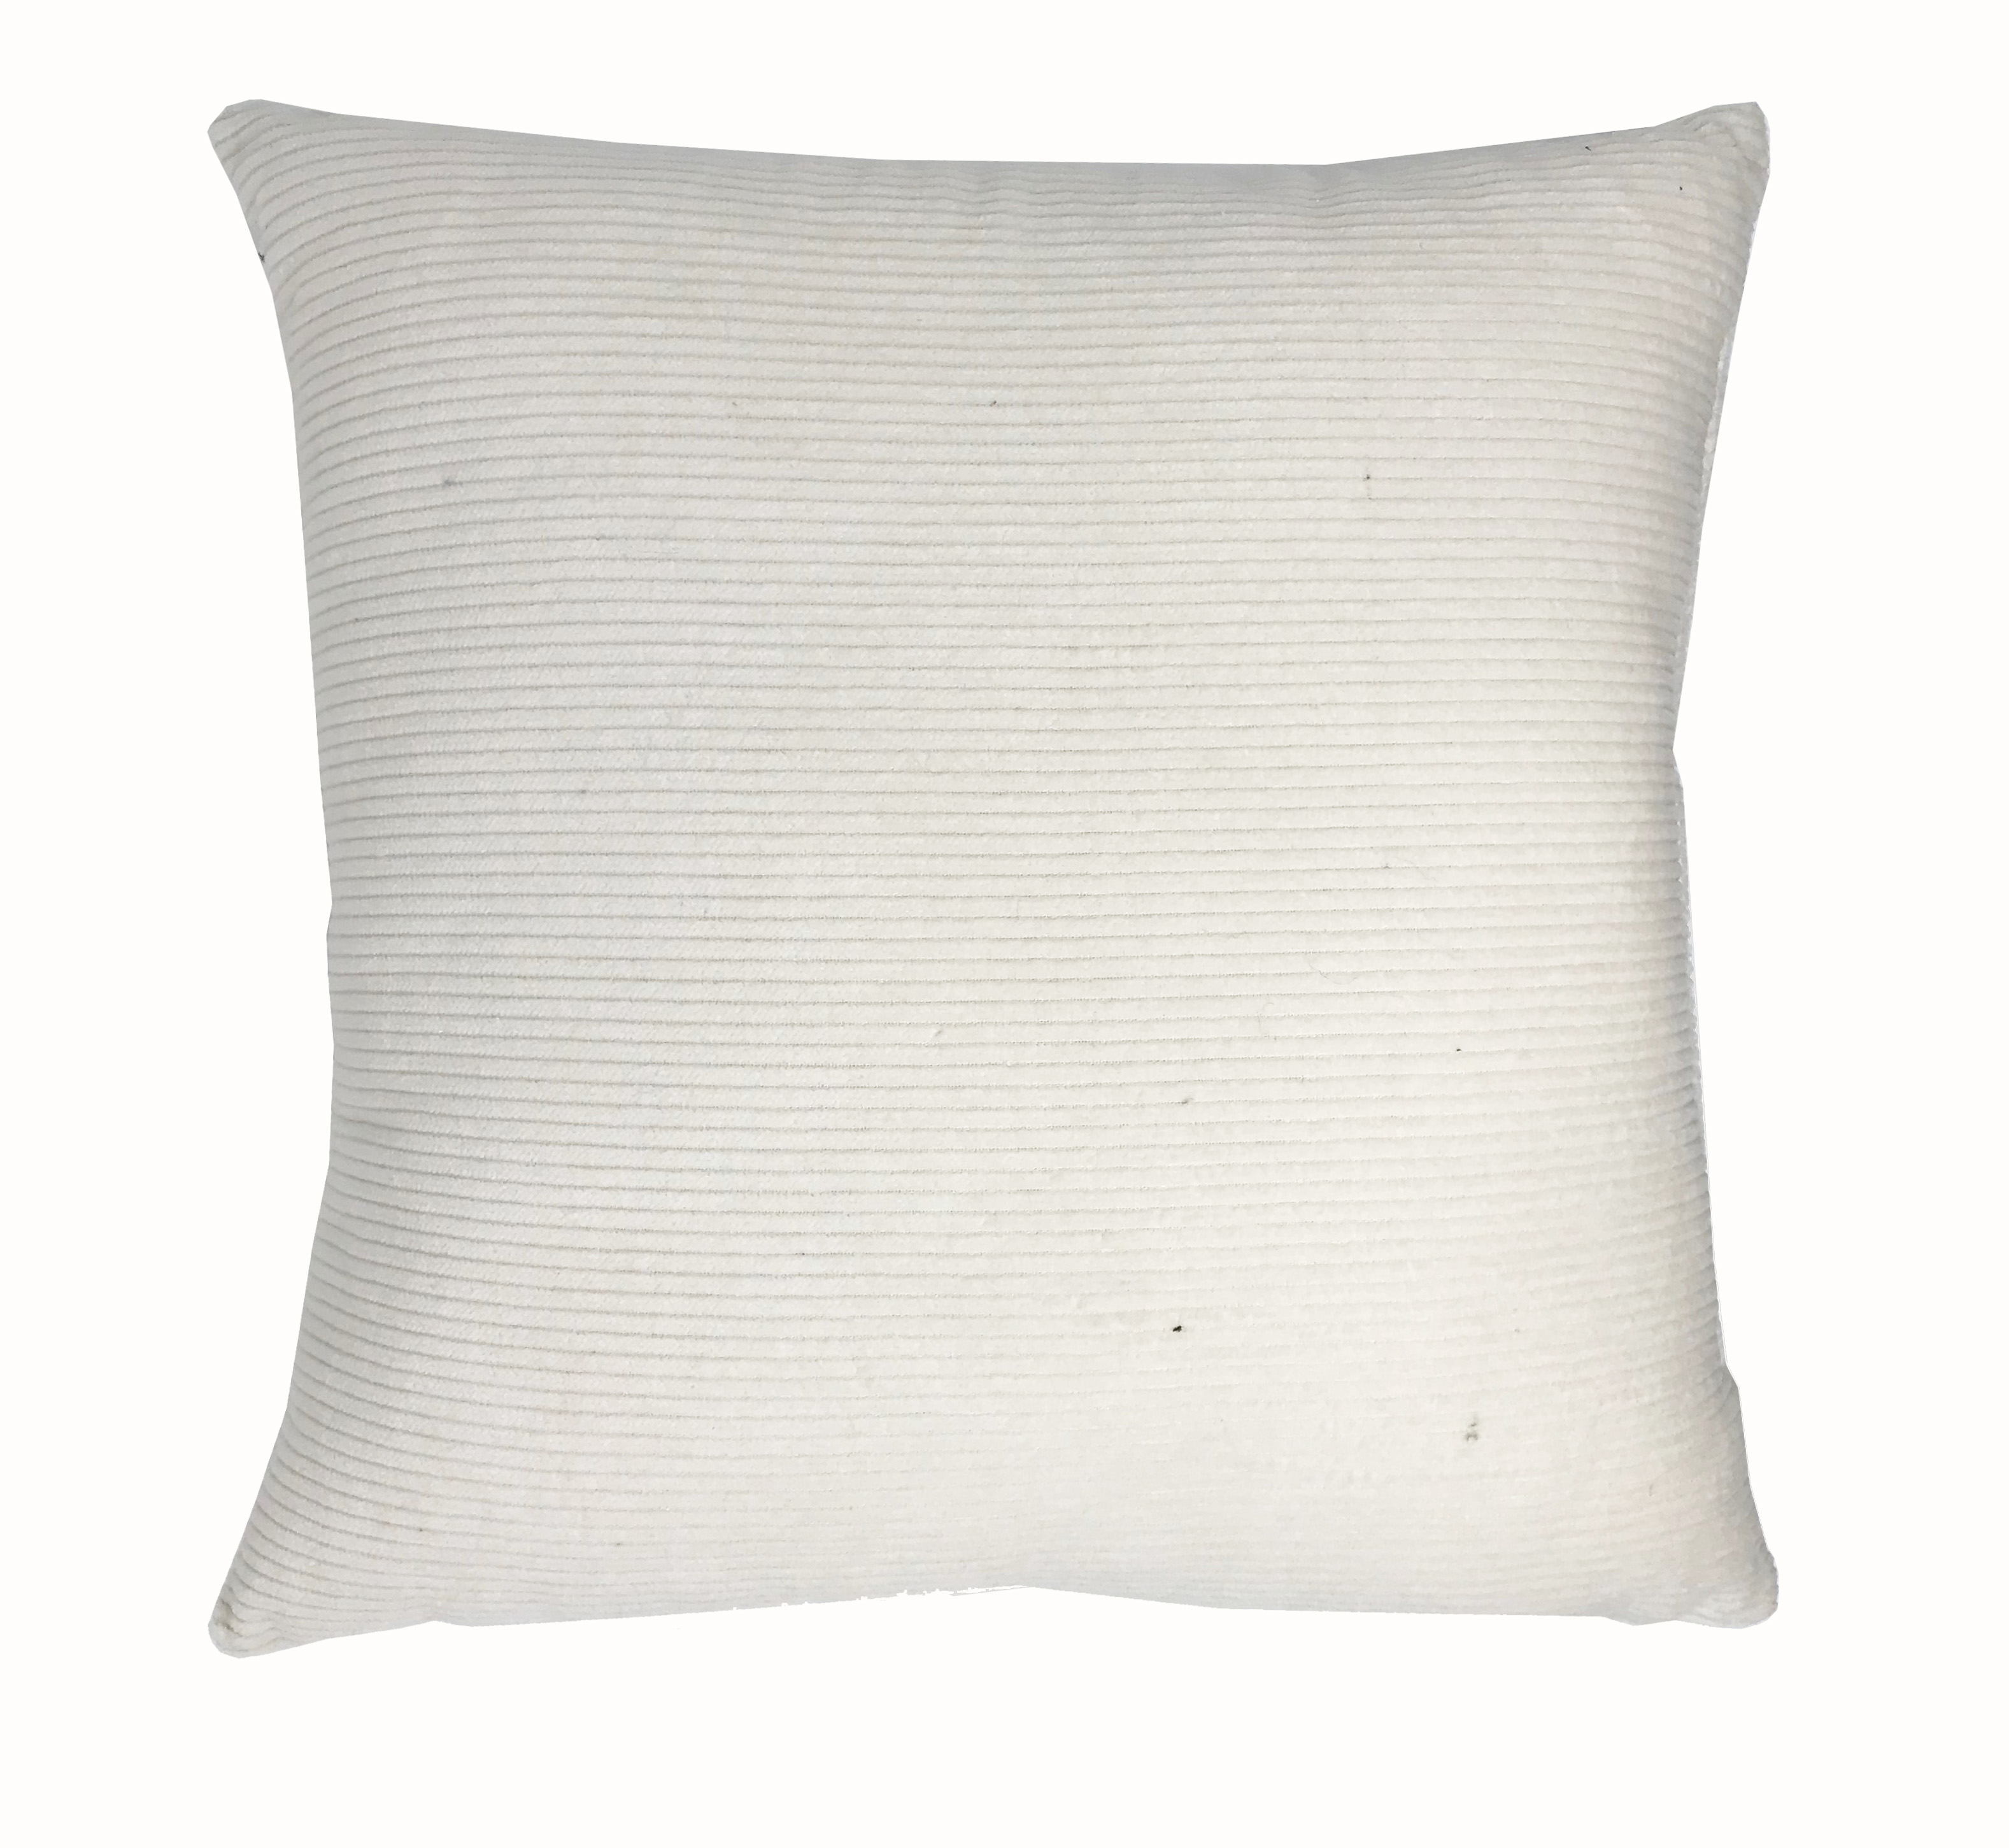 Ivory Cord 45cm x 45cm Cushion